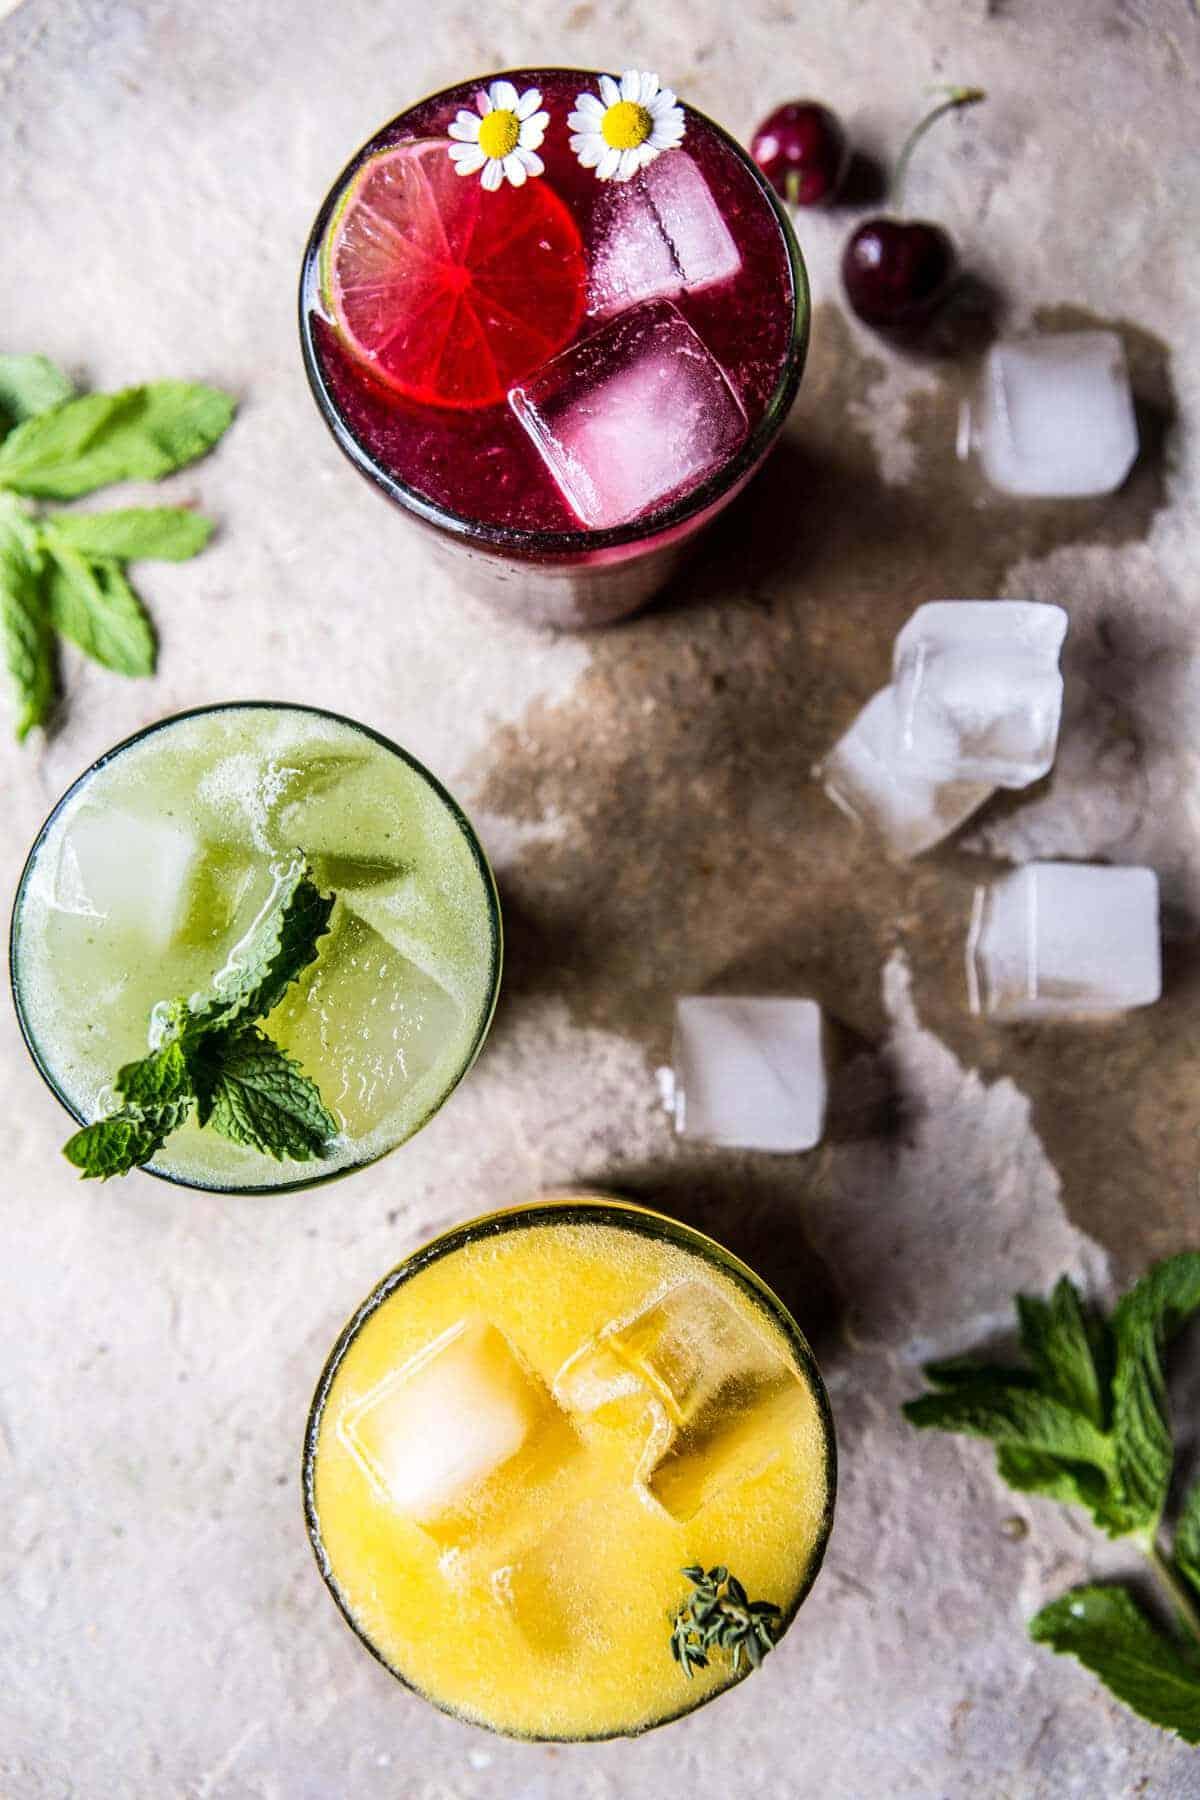 Summer Sodas 3 Ways | halfbakedharvest.com @hbharvest